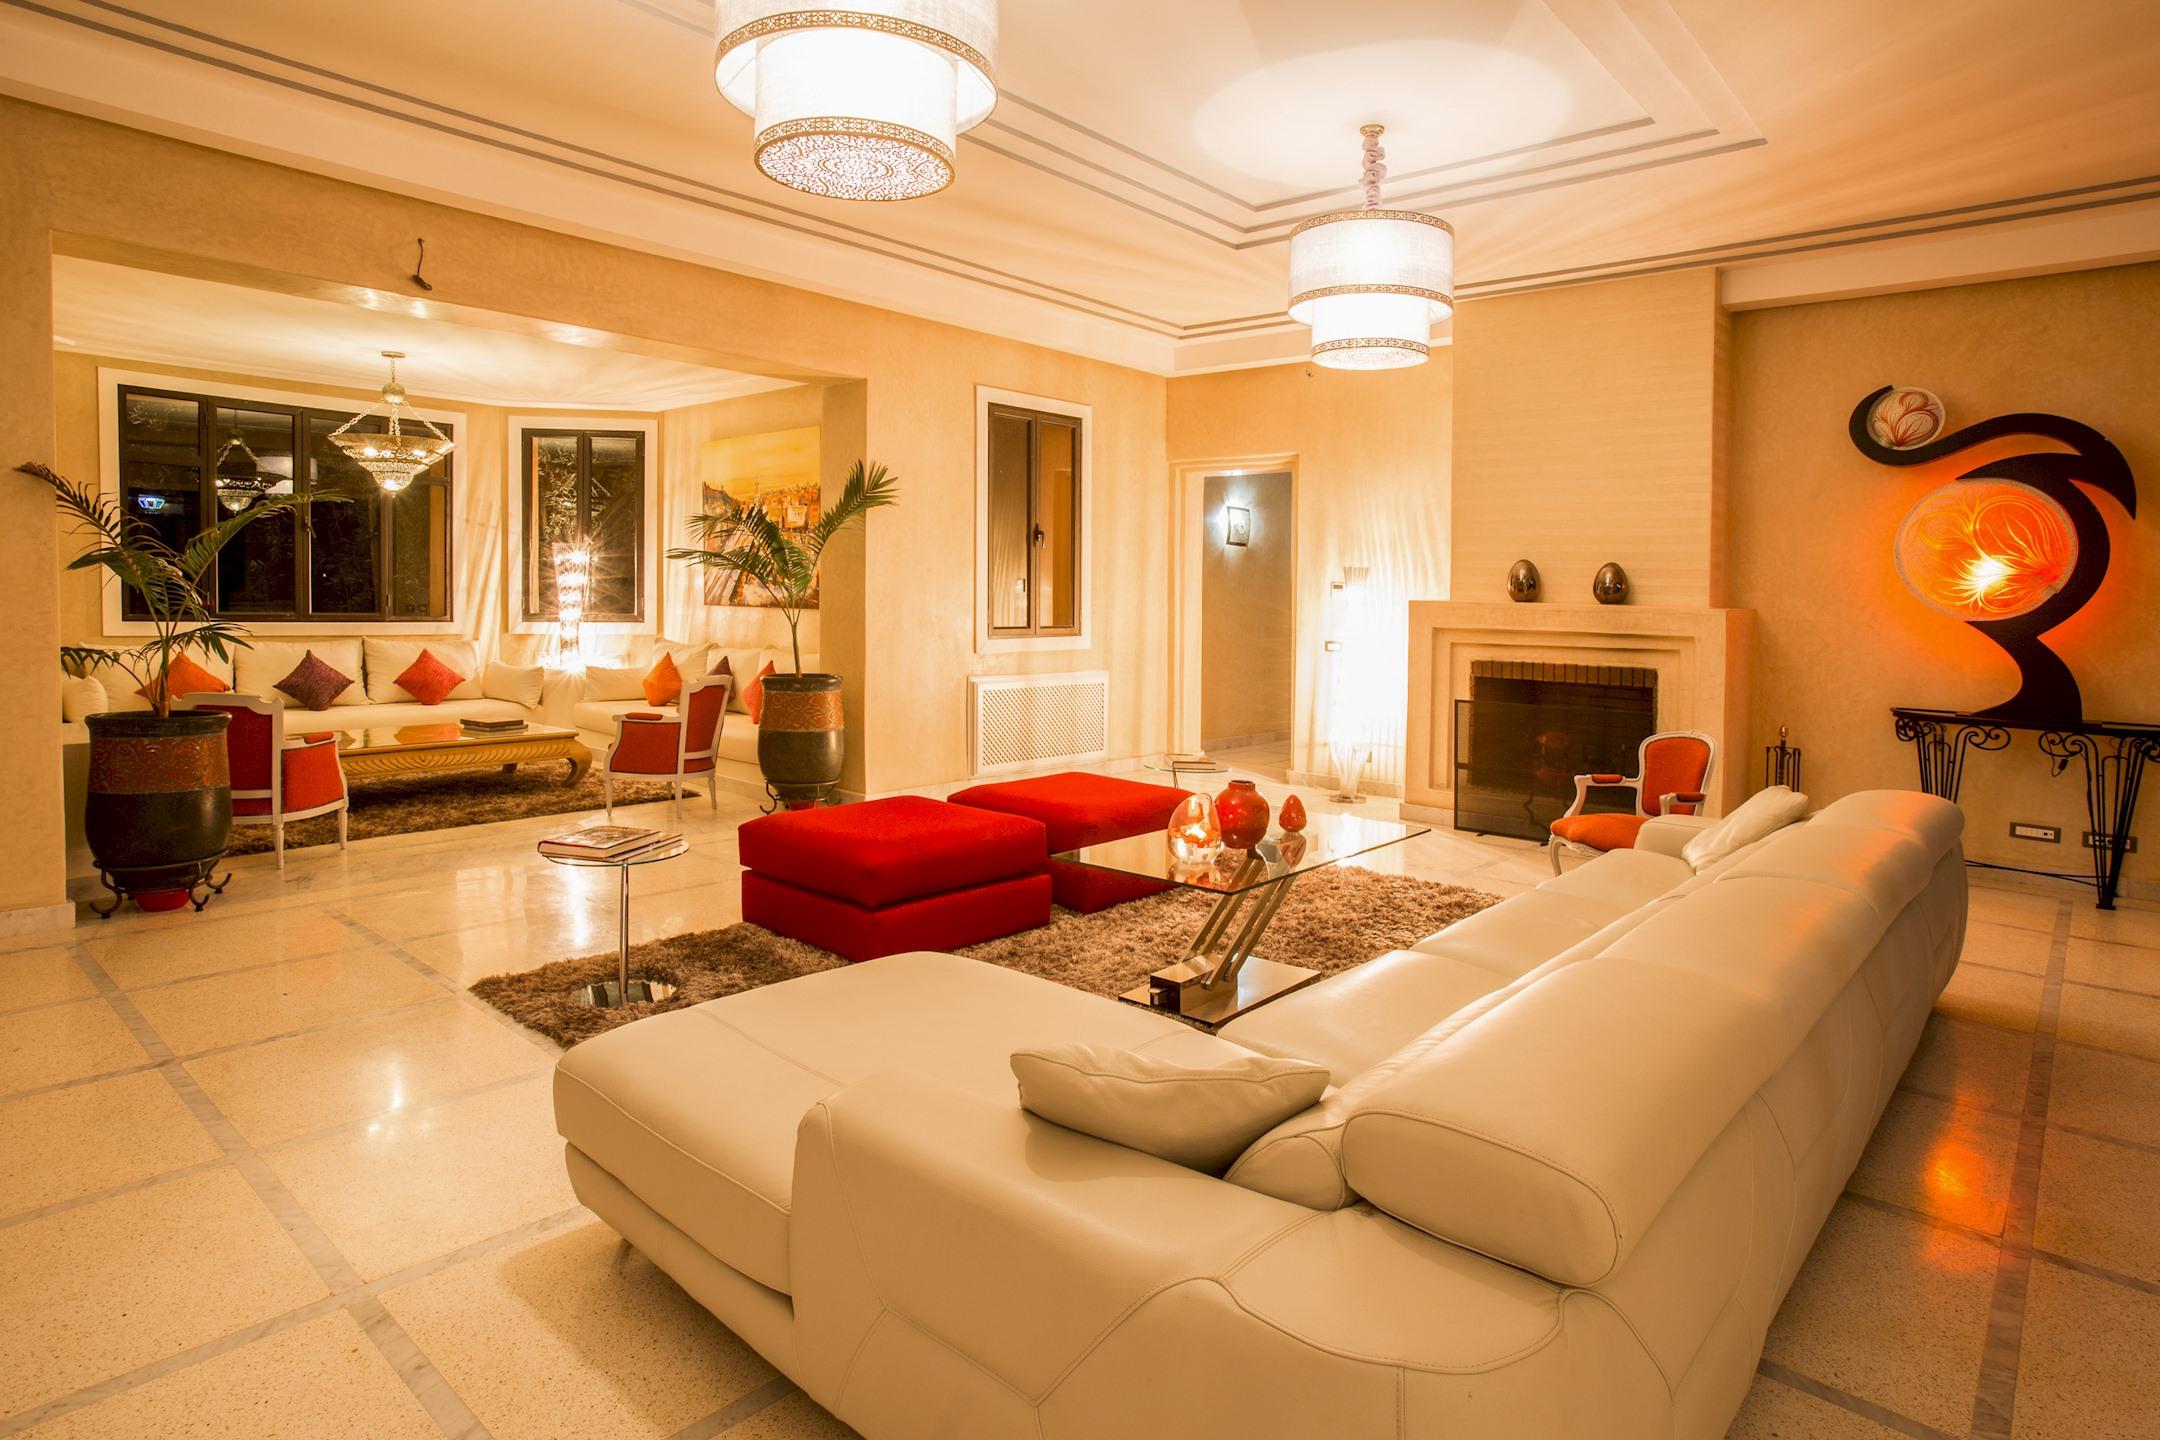 Apartment VILLA KOUTOUBIA - PISCINE CHAUFFEE  HAMMAM  JACUZZI  PETIT-DEJEUNER A MARRAKECH photo 20295907